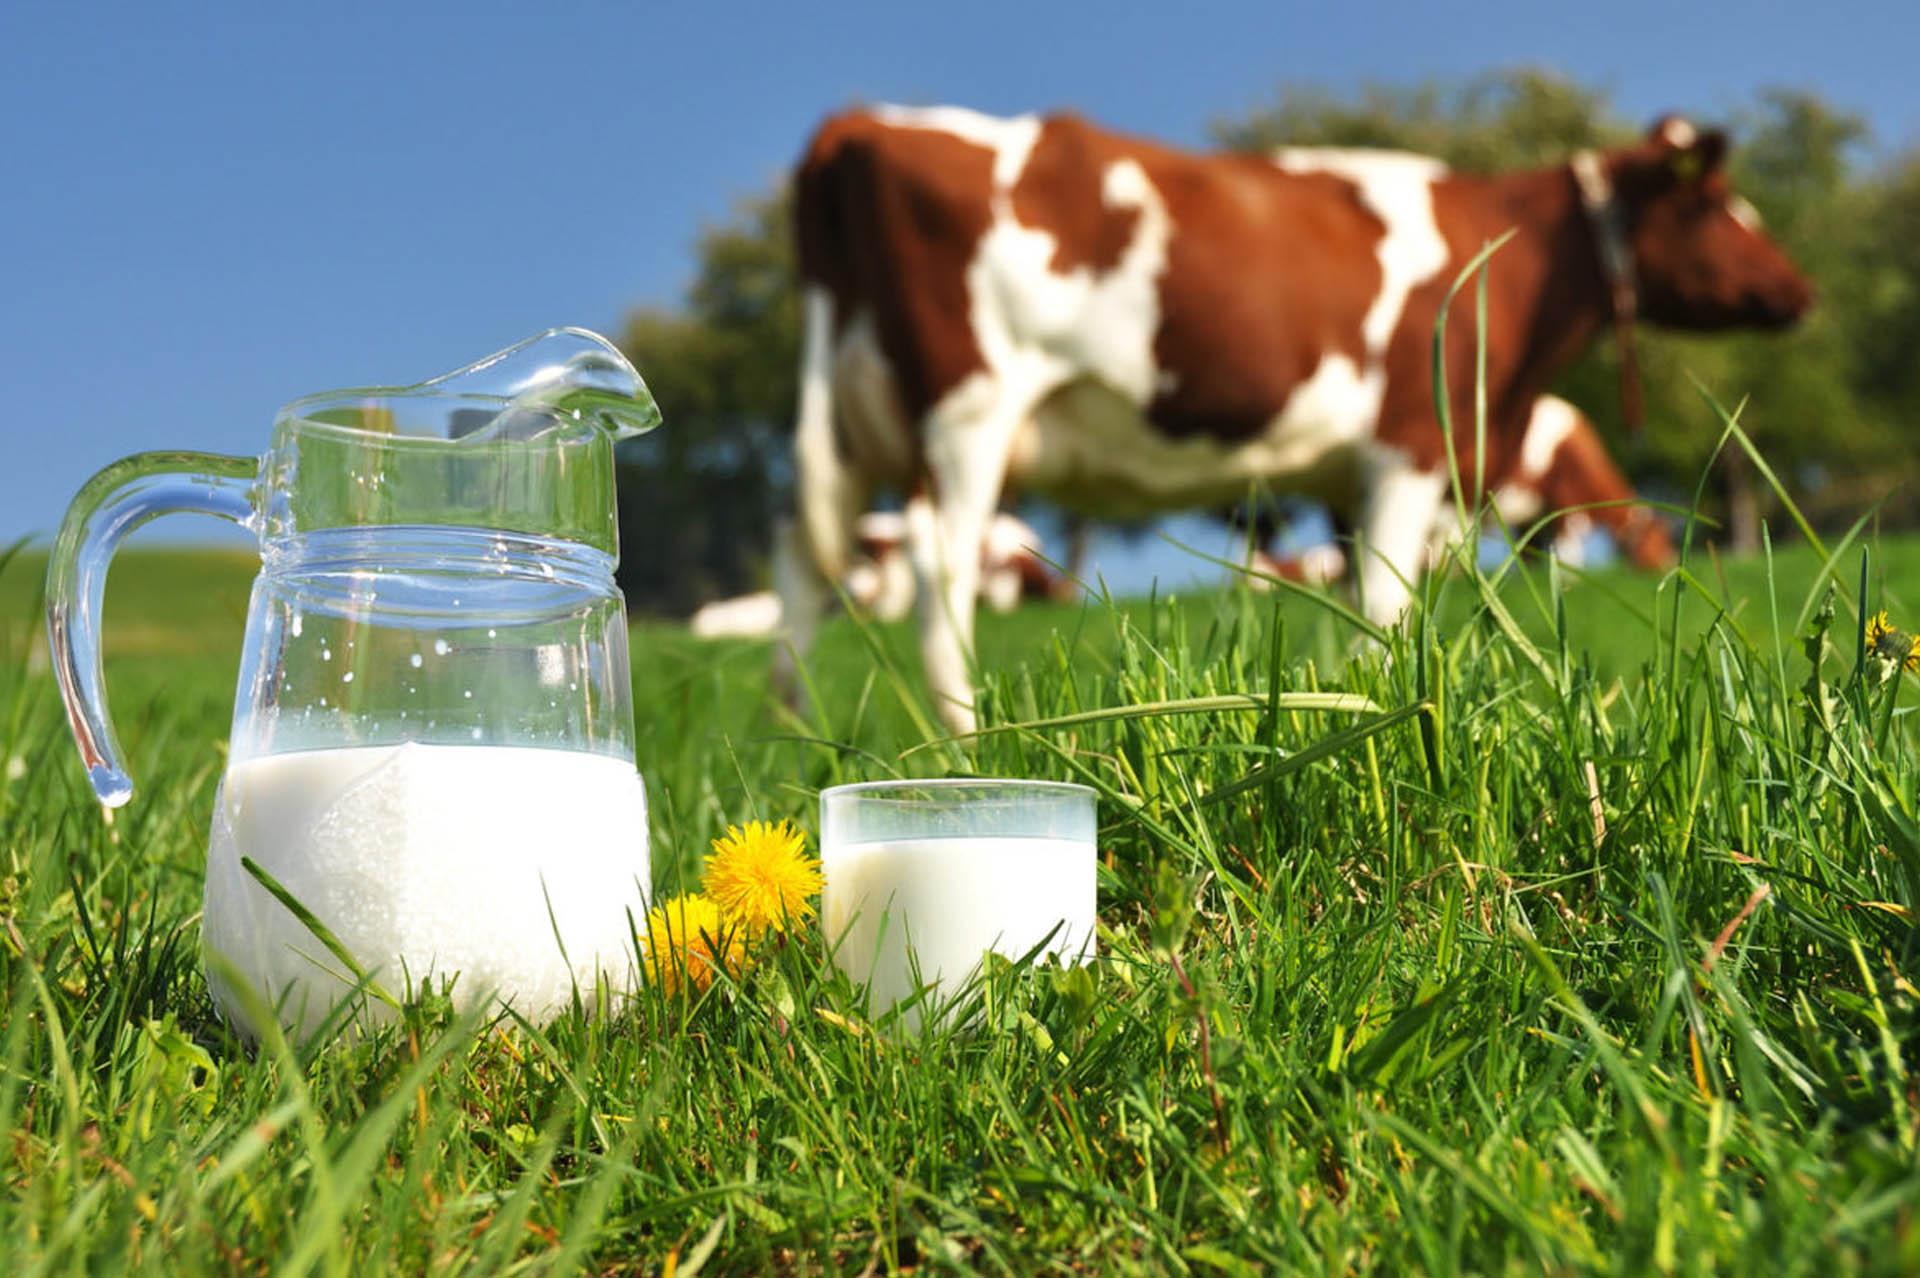 proveedor de materias primas para alimentos de ganado lechero mexico